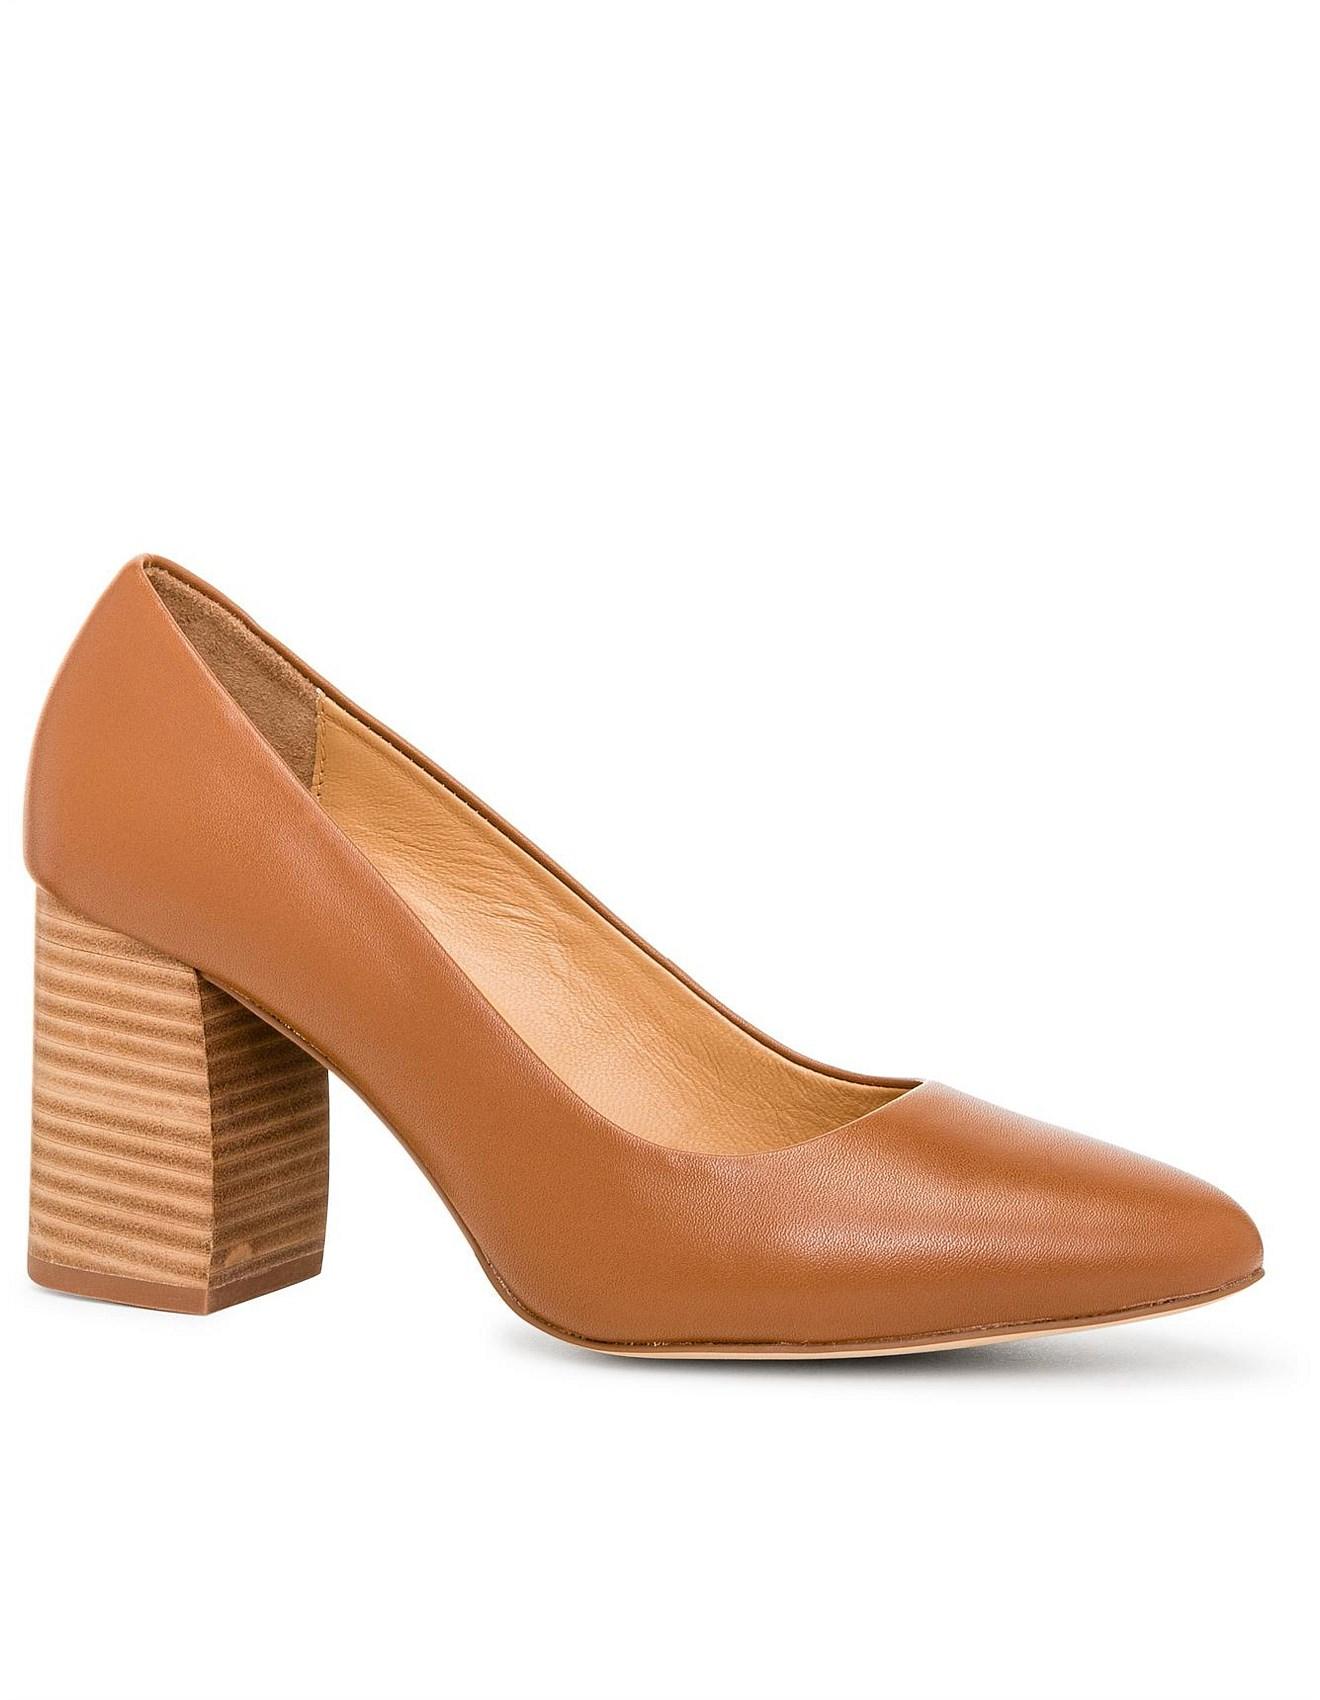 42b8074f33f Best Selling Shoes